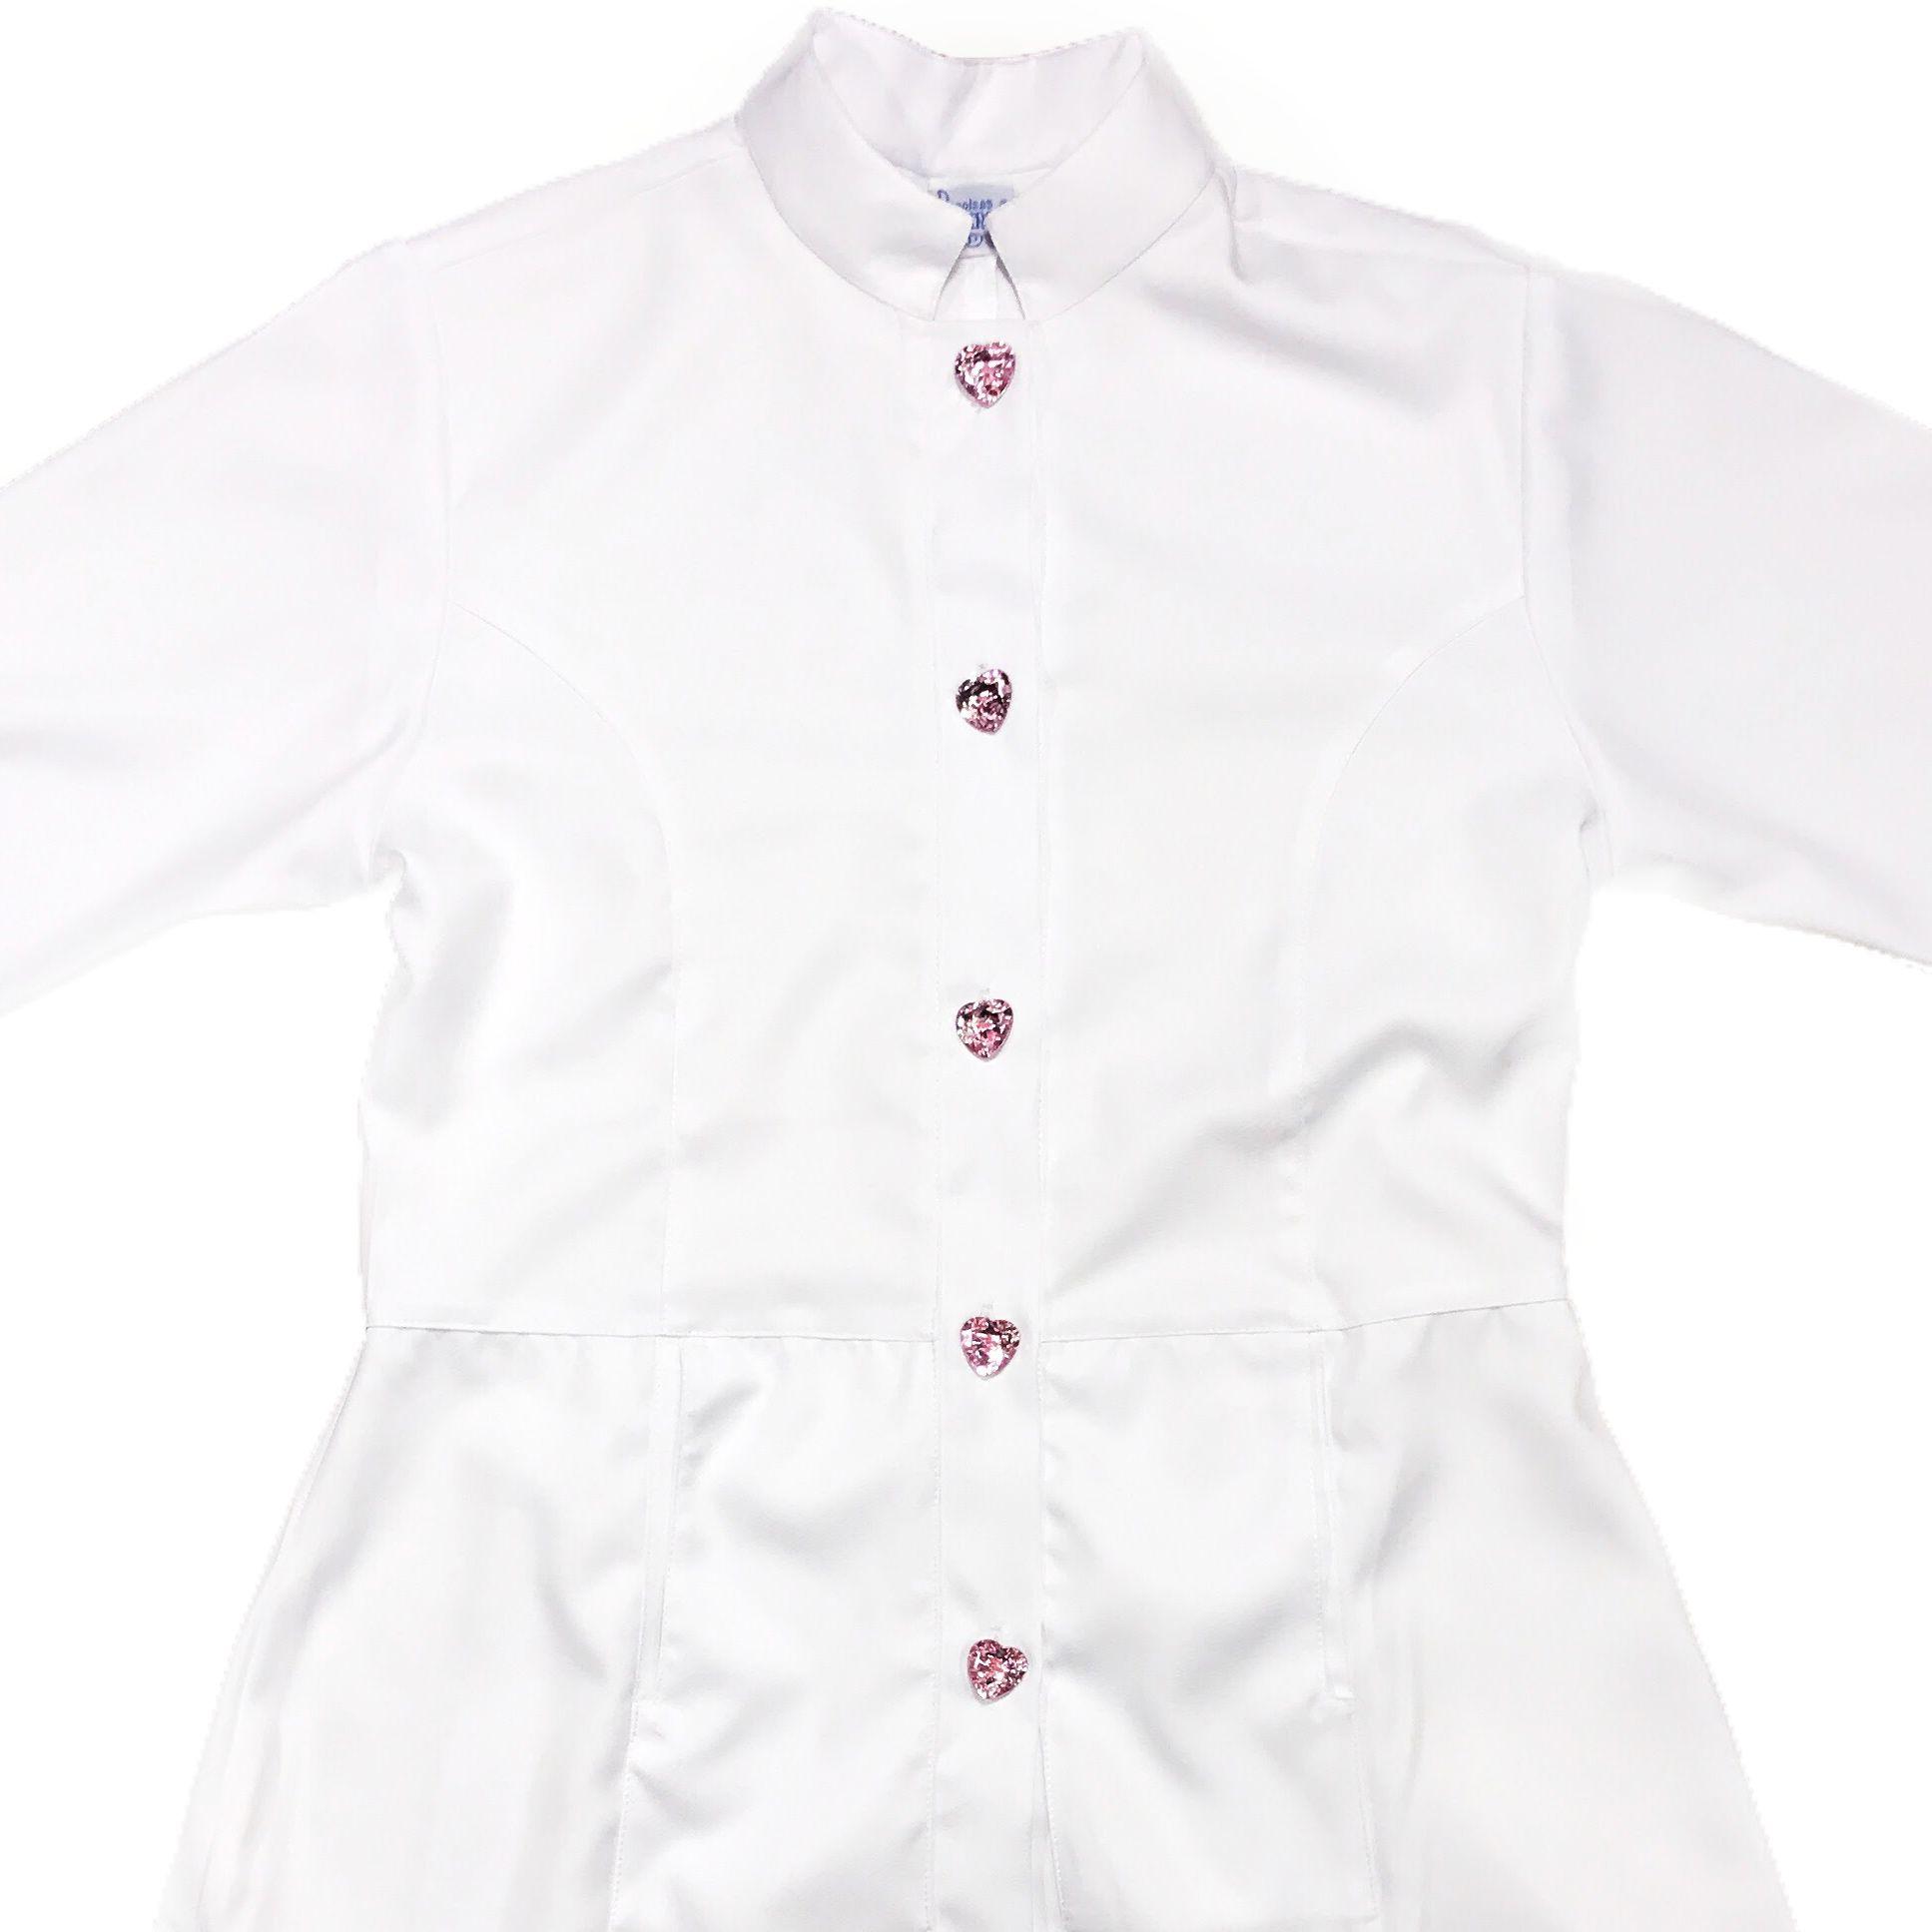 Jaleco Sissi Dress PINK HEART Feminino Acinturado  ML Microfibra PREMIUM